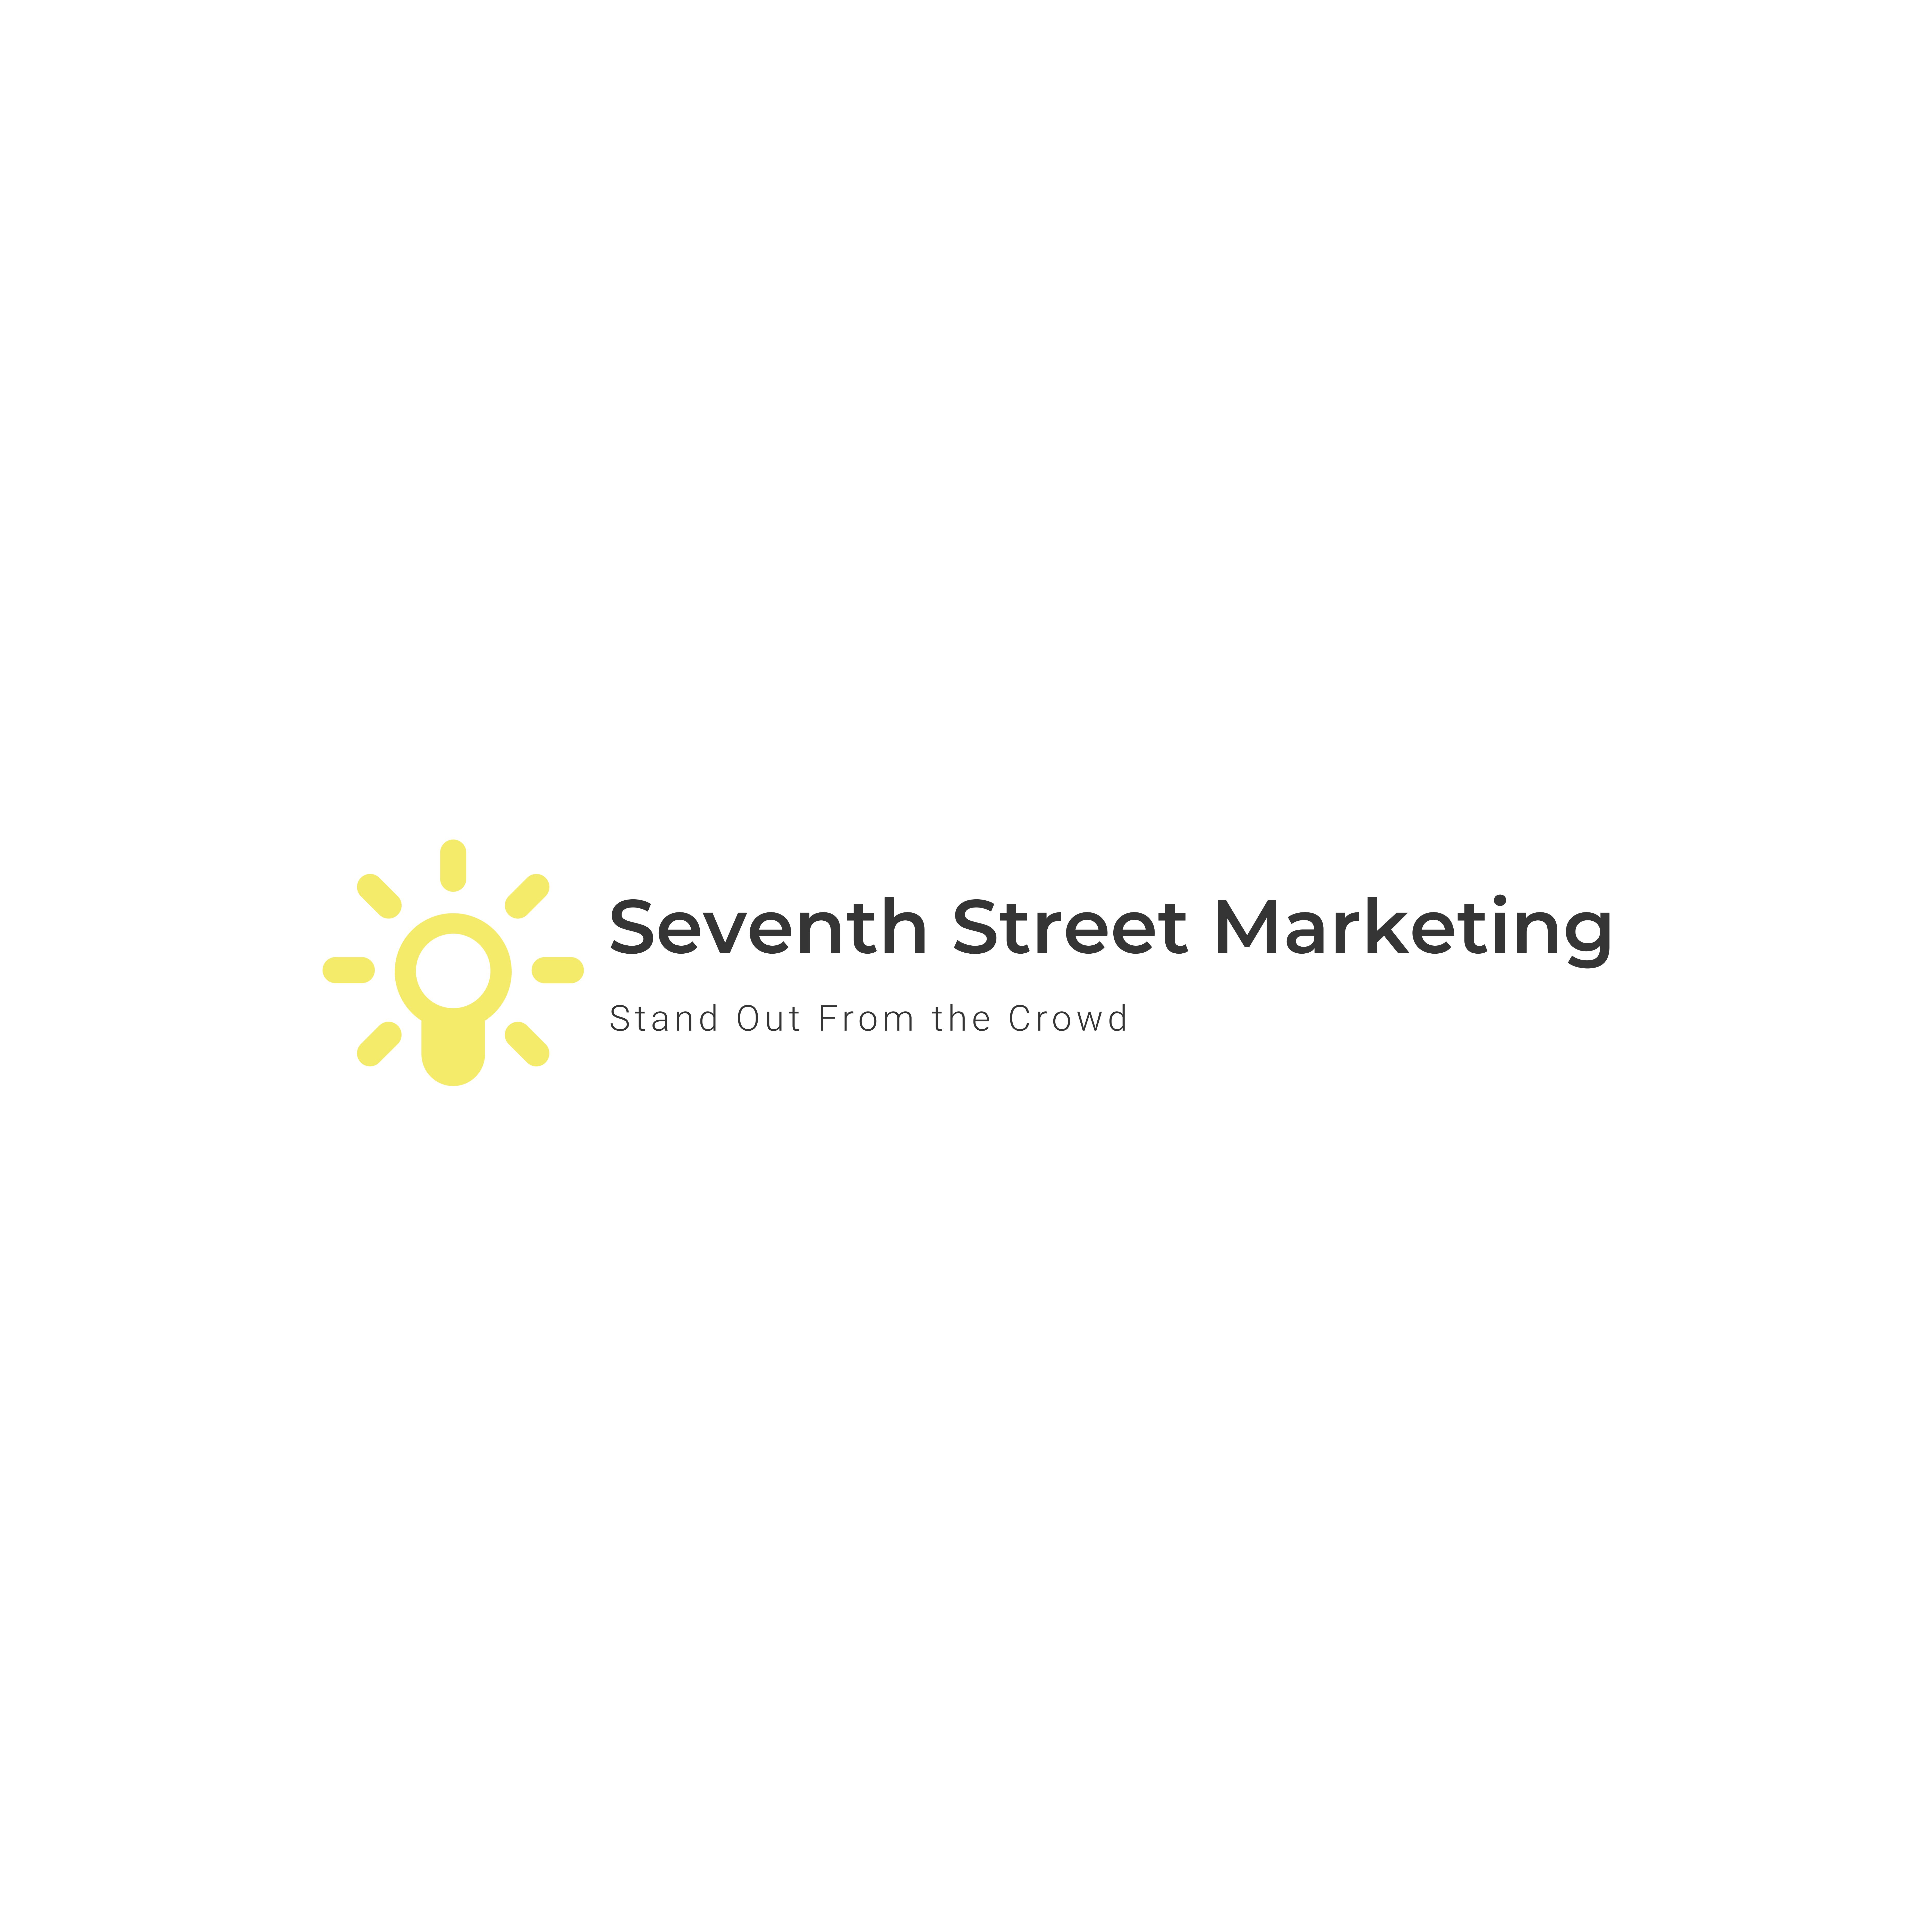 Seventh Street Marketing, a chatbot developer